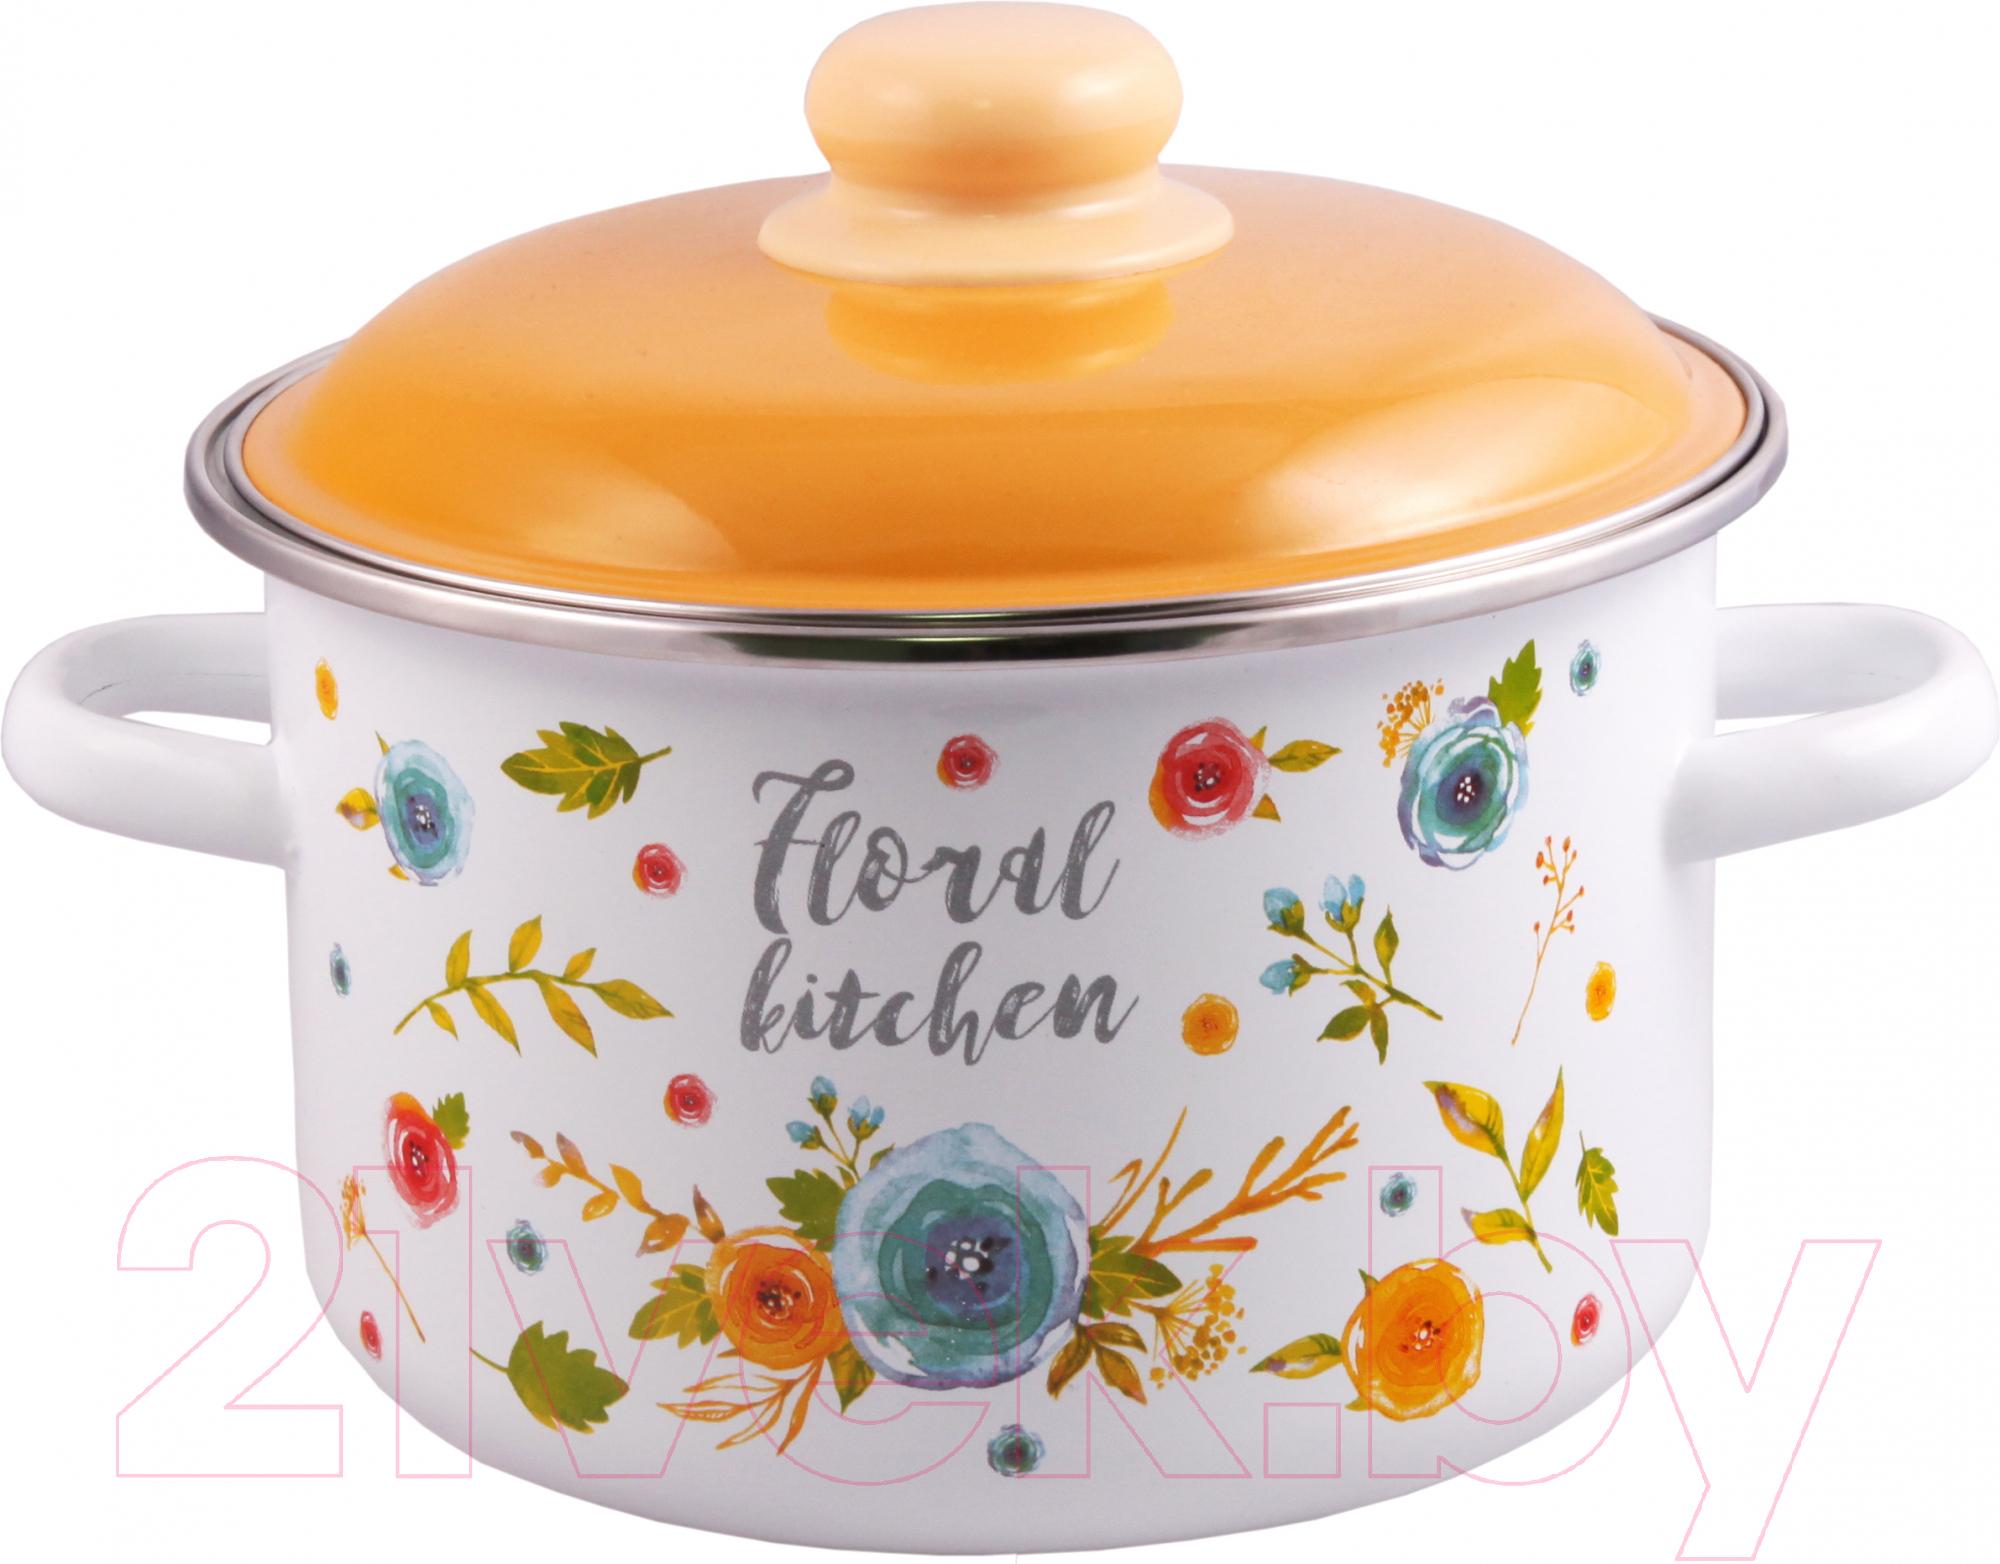 Купить Кастрюля Appetite, Floral Kitchen 6RD221M, Россия